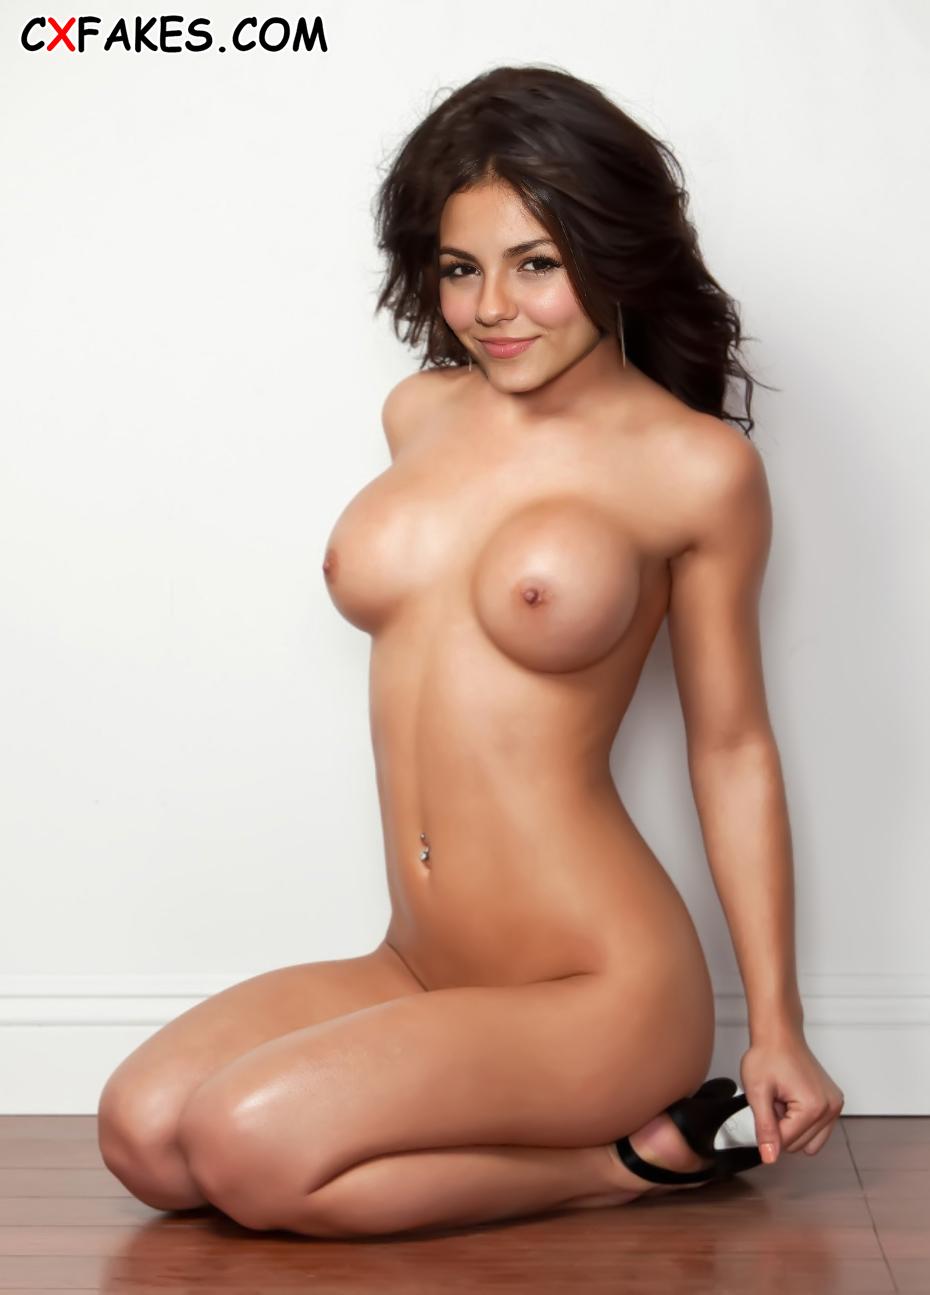 Camila nackt Alves 25 Hottest